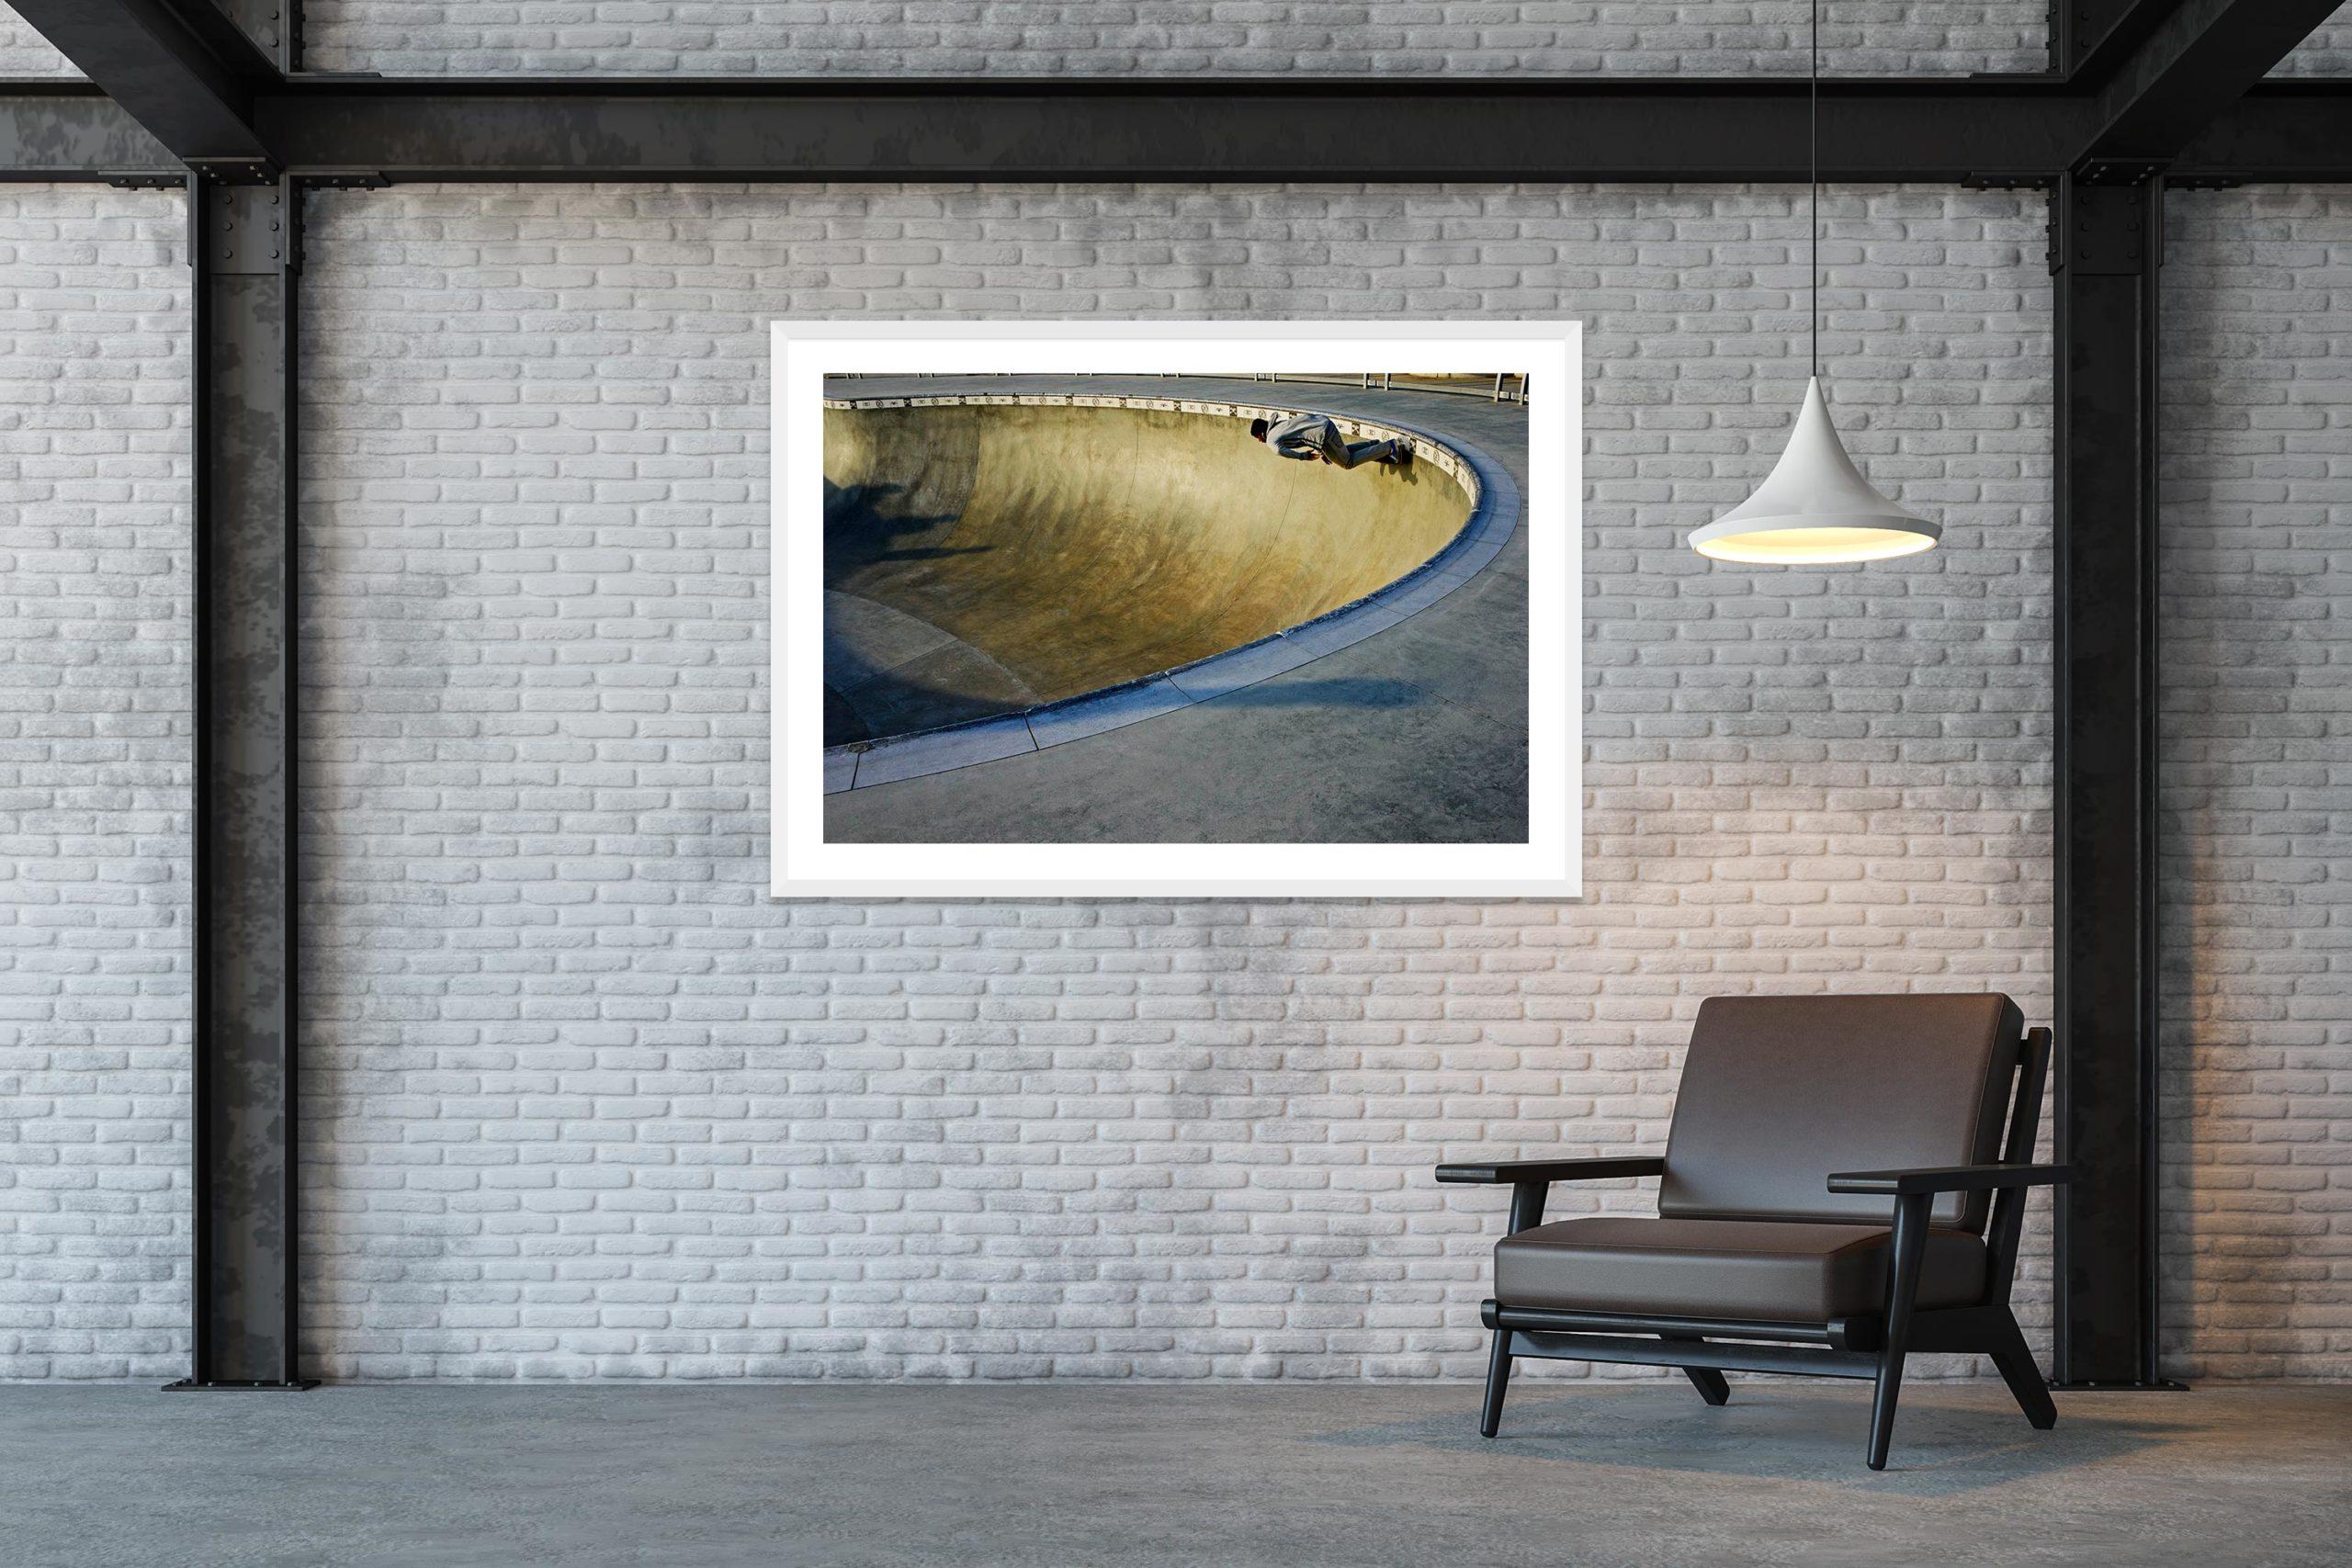 Blue Dream - White Frame - Skate Park, Venice Beach Collection - Fine Art Photography by Toby Dixon